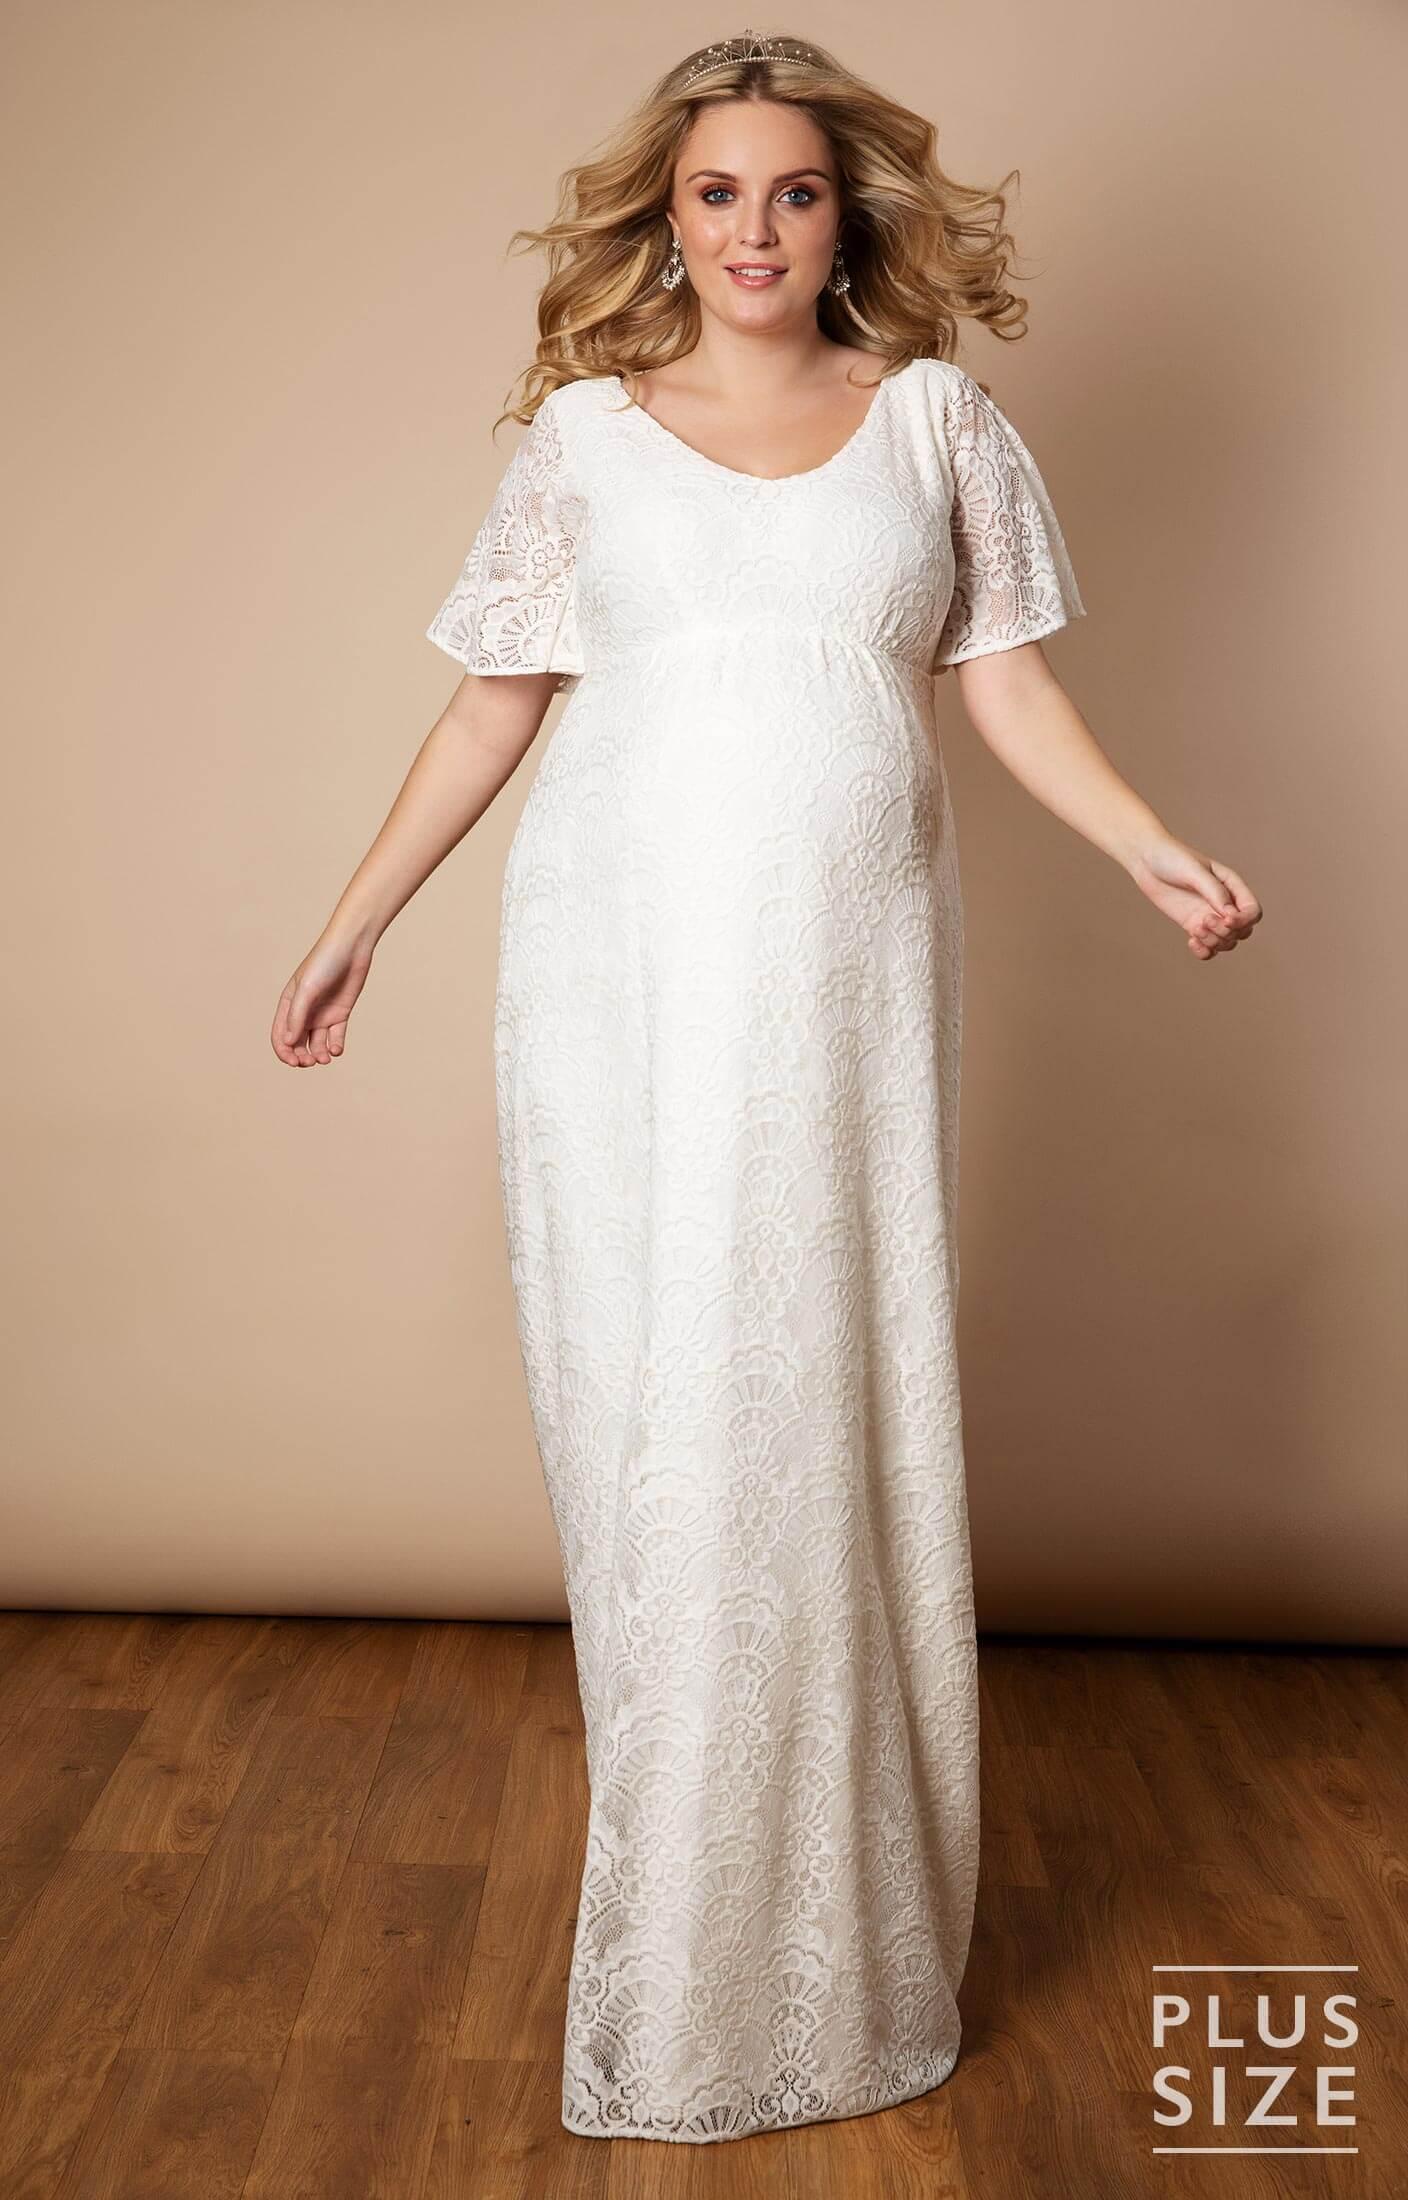 fec93066cba0 Edith Kimono Plus Size Maternity Wedding Gown Ivory by Tiffany Rose